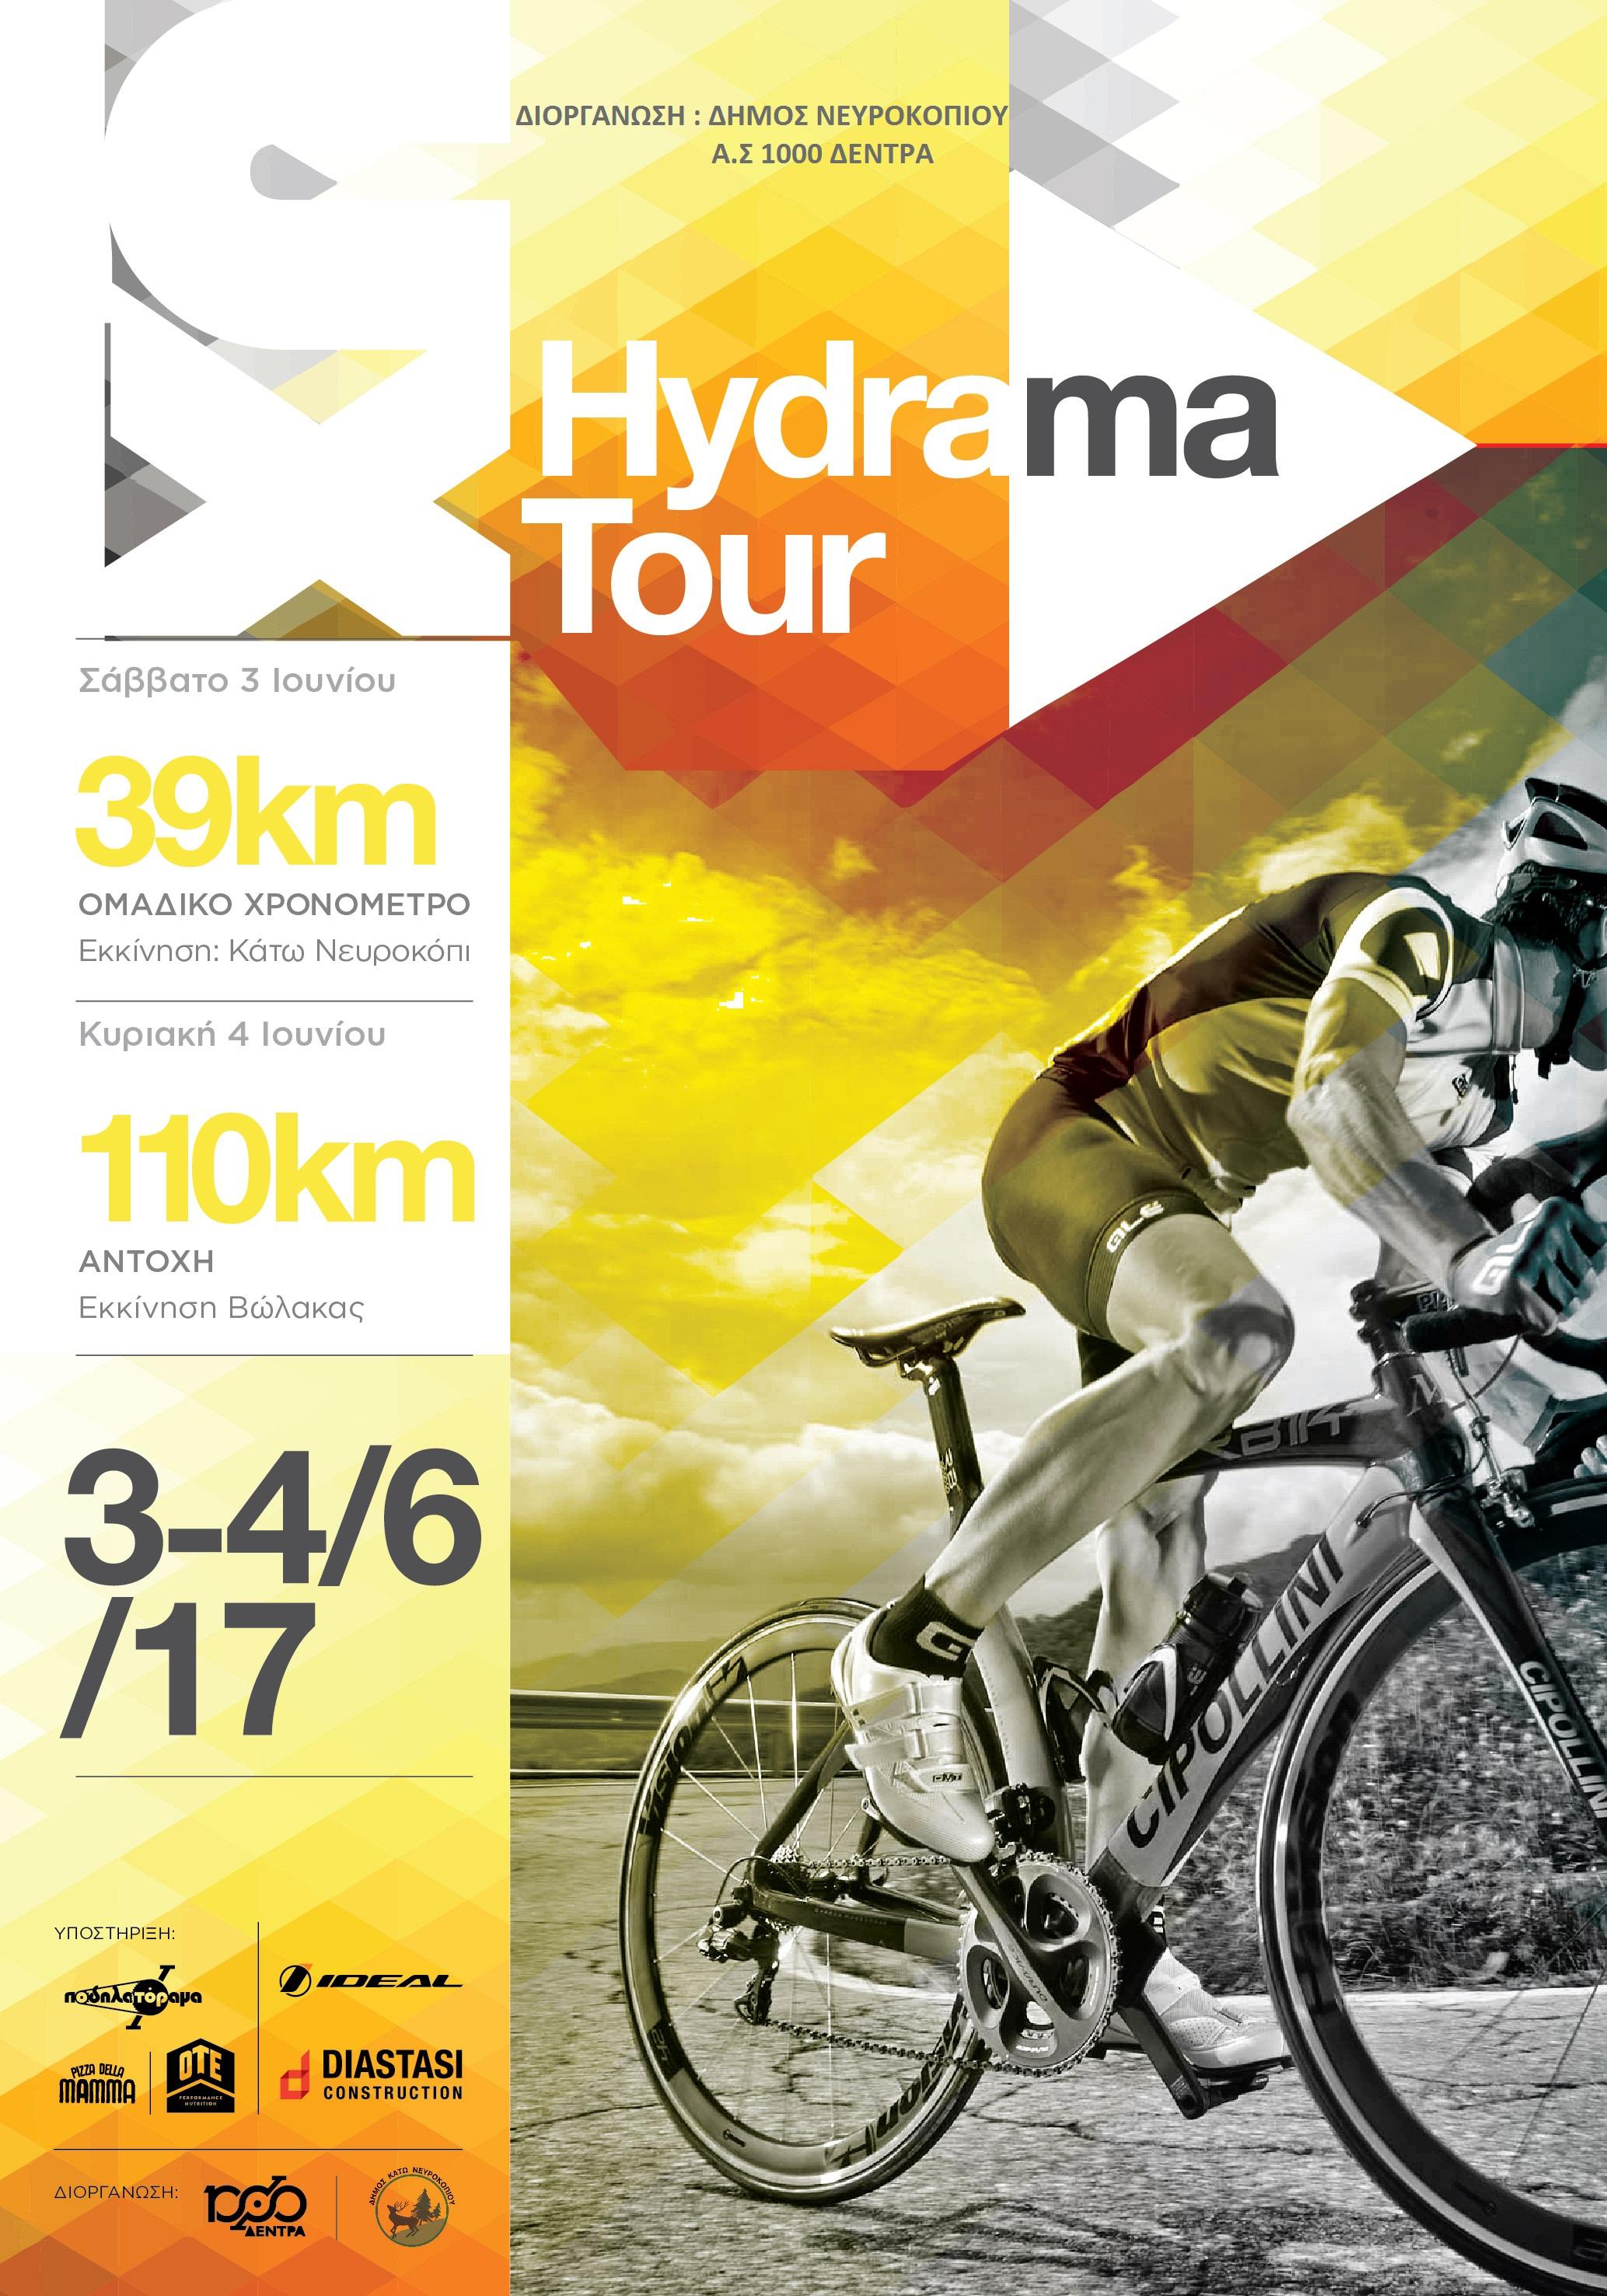 HYDRAMA TOUR 2017